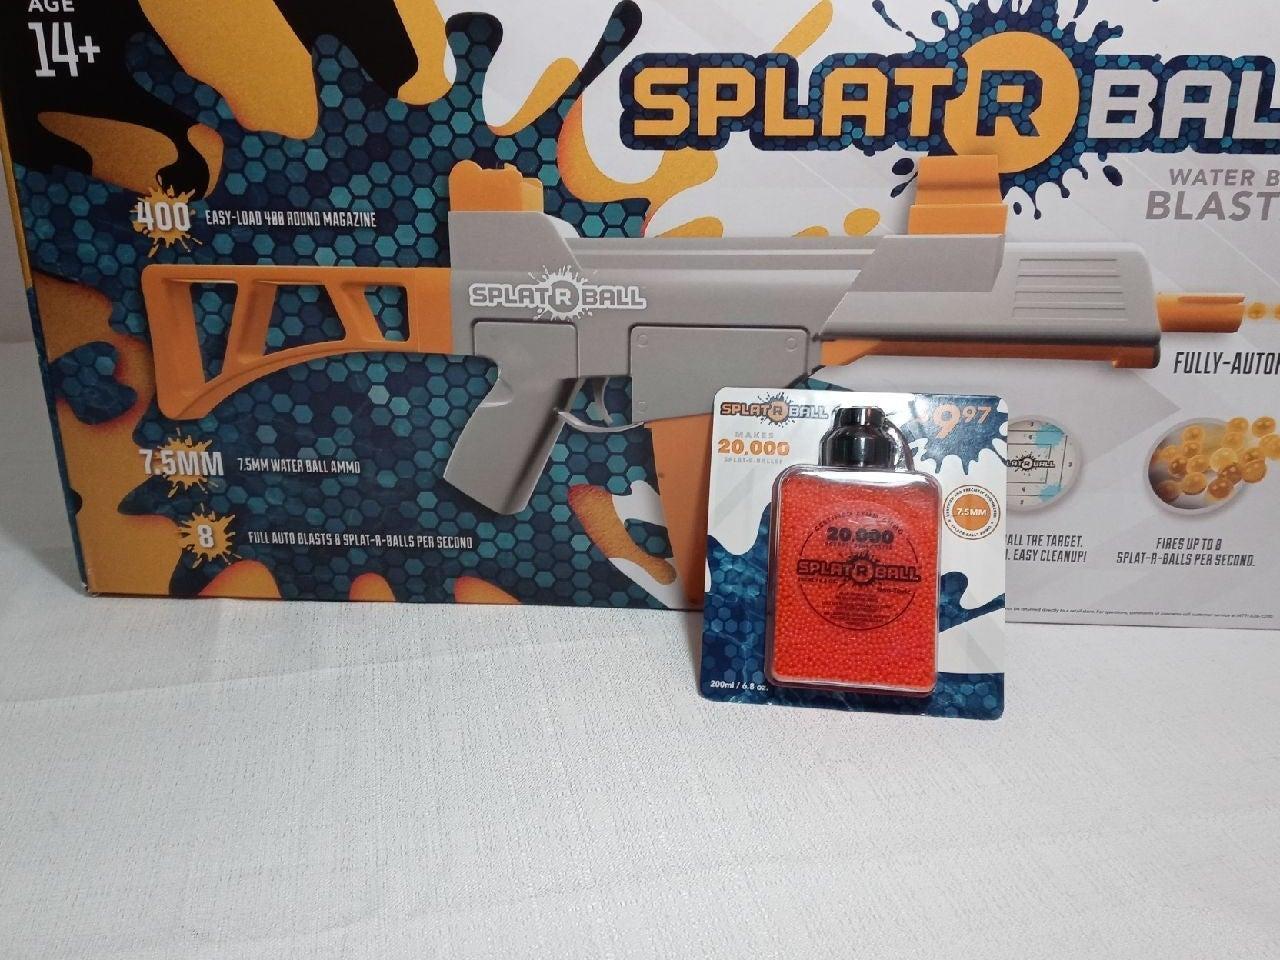 SPLAT R BALL water bead blaster and refi